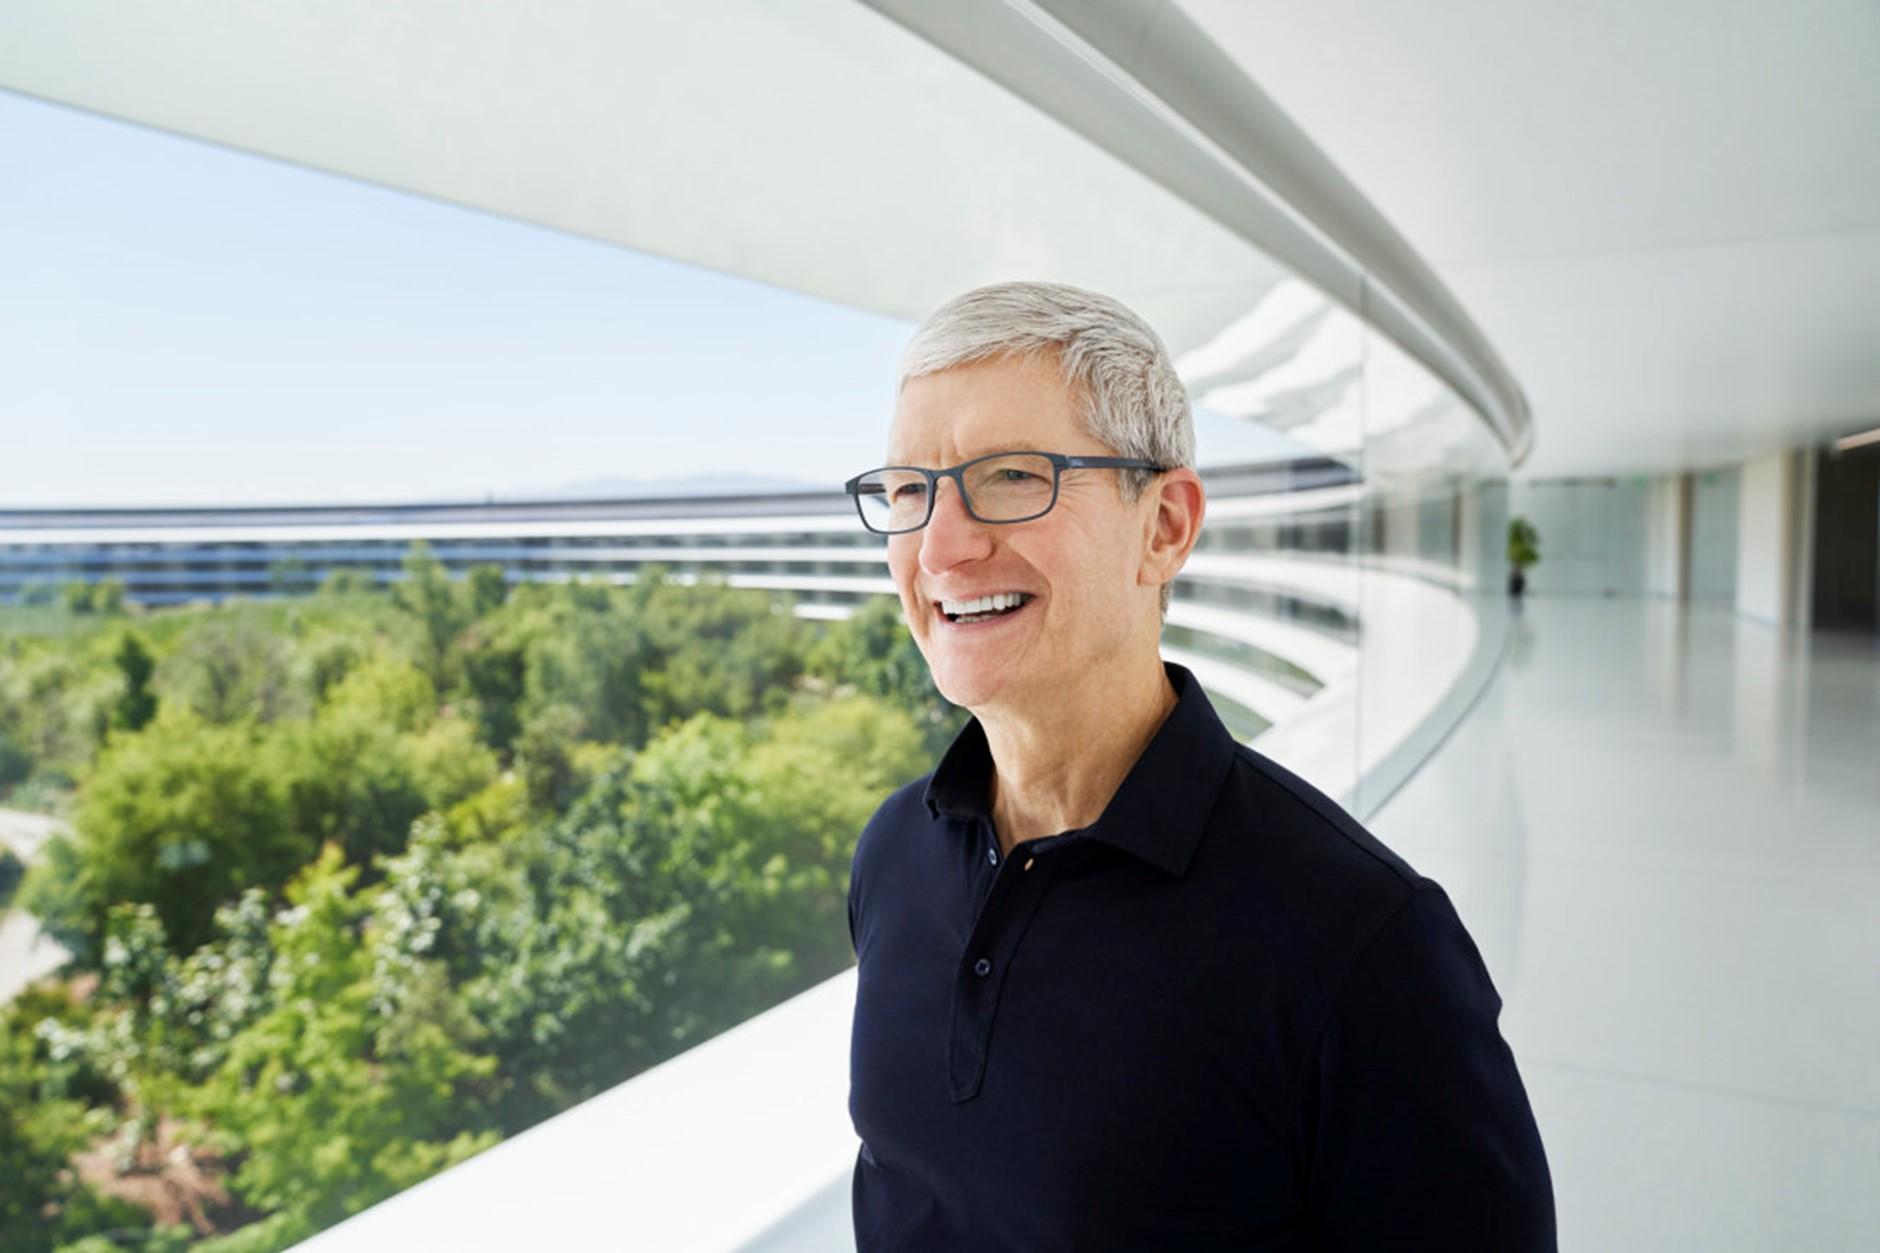 CEO Tim Cook tại trụ sở Apple Park. Ảnh: AFR